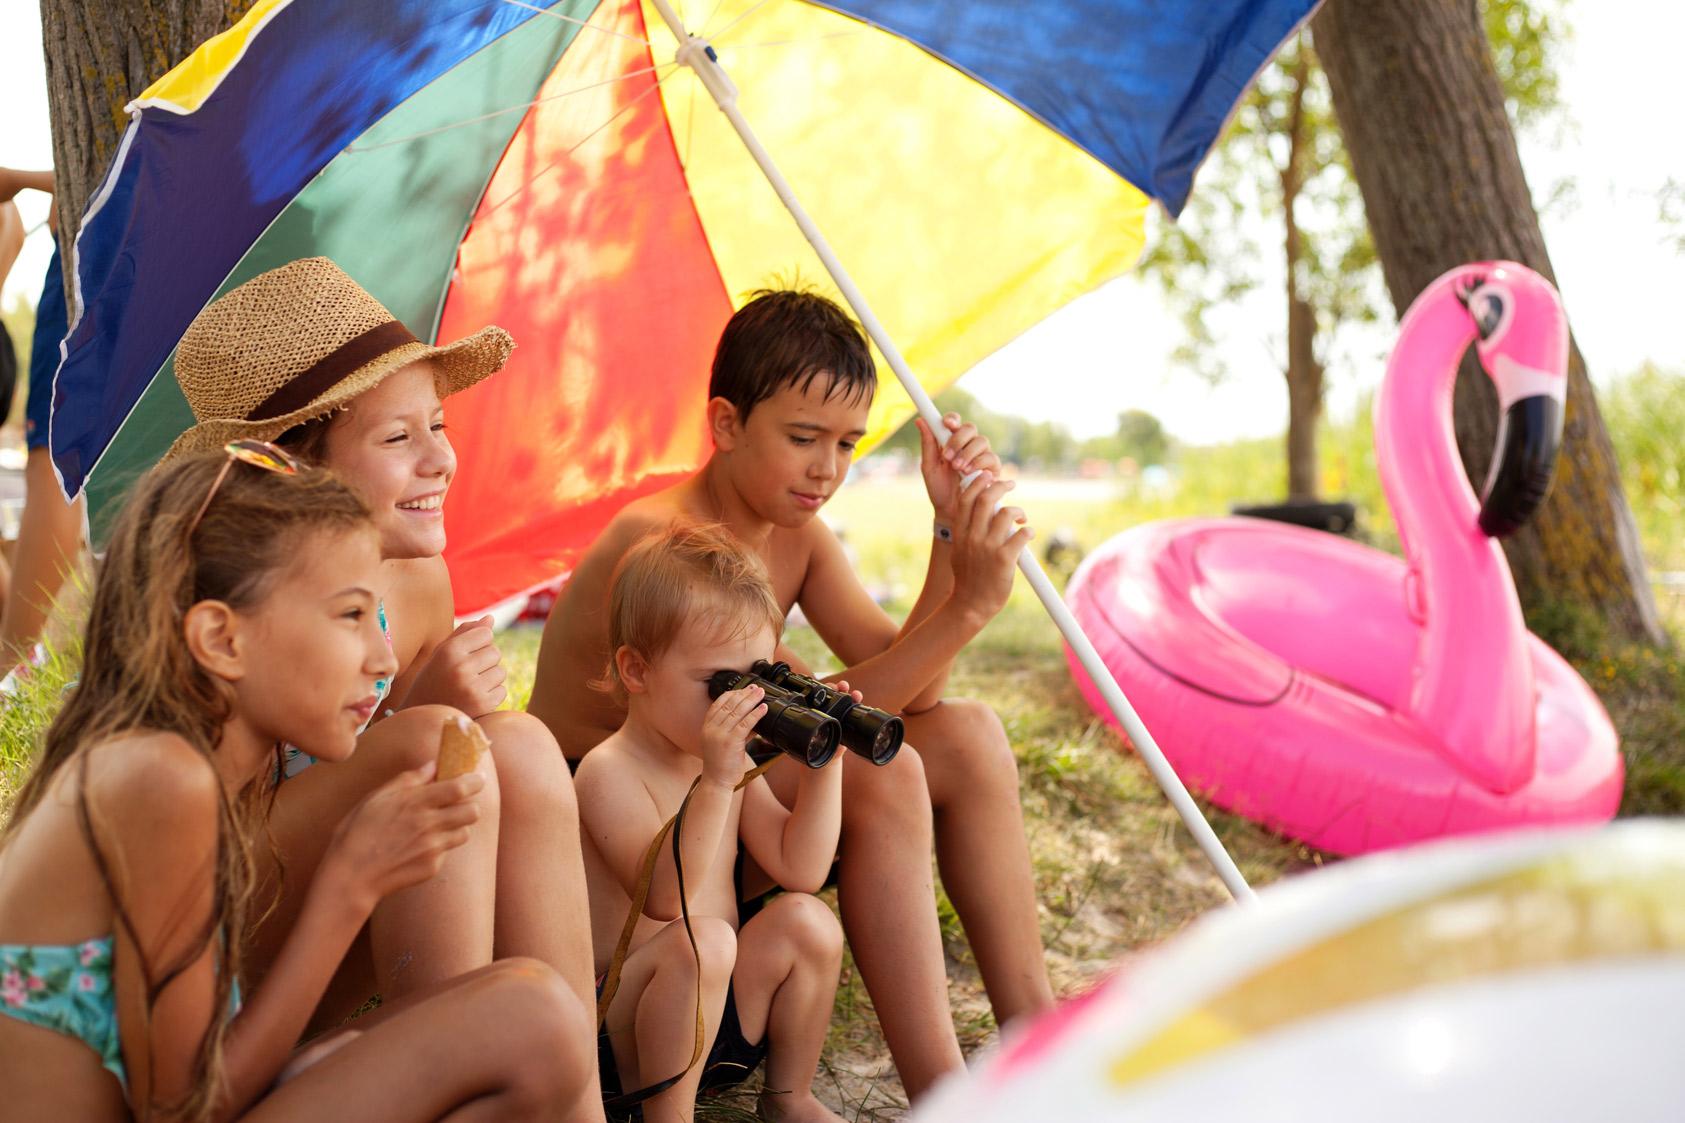 Kinder am See, Sonnenbad, Eis